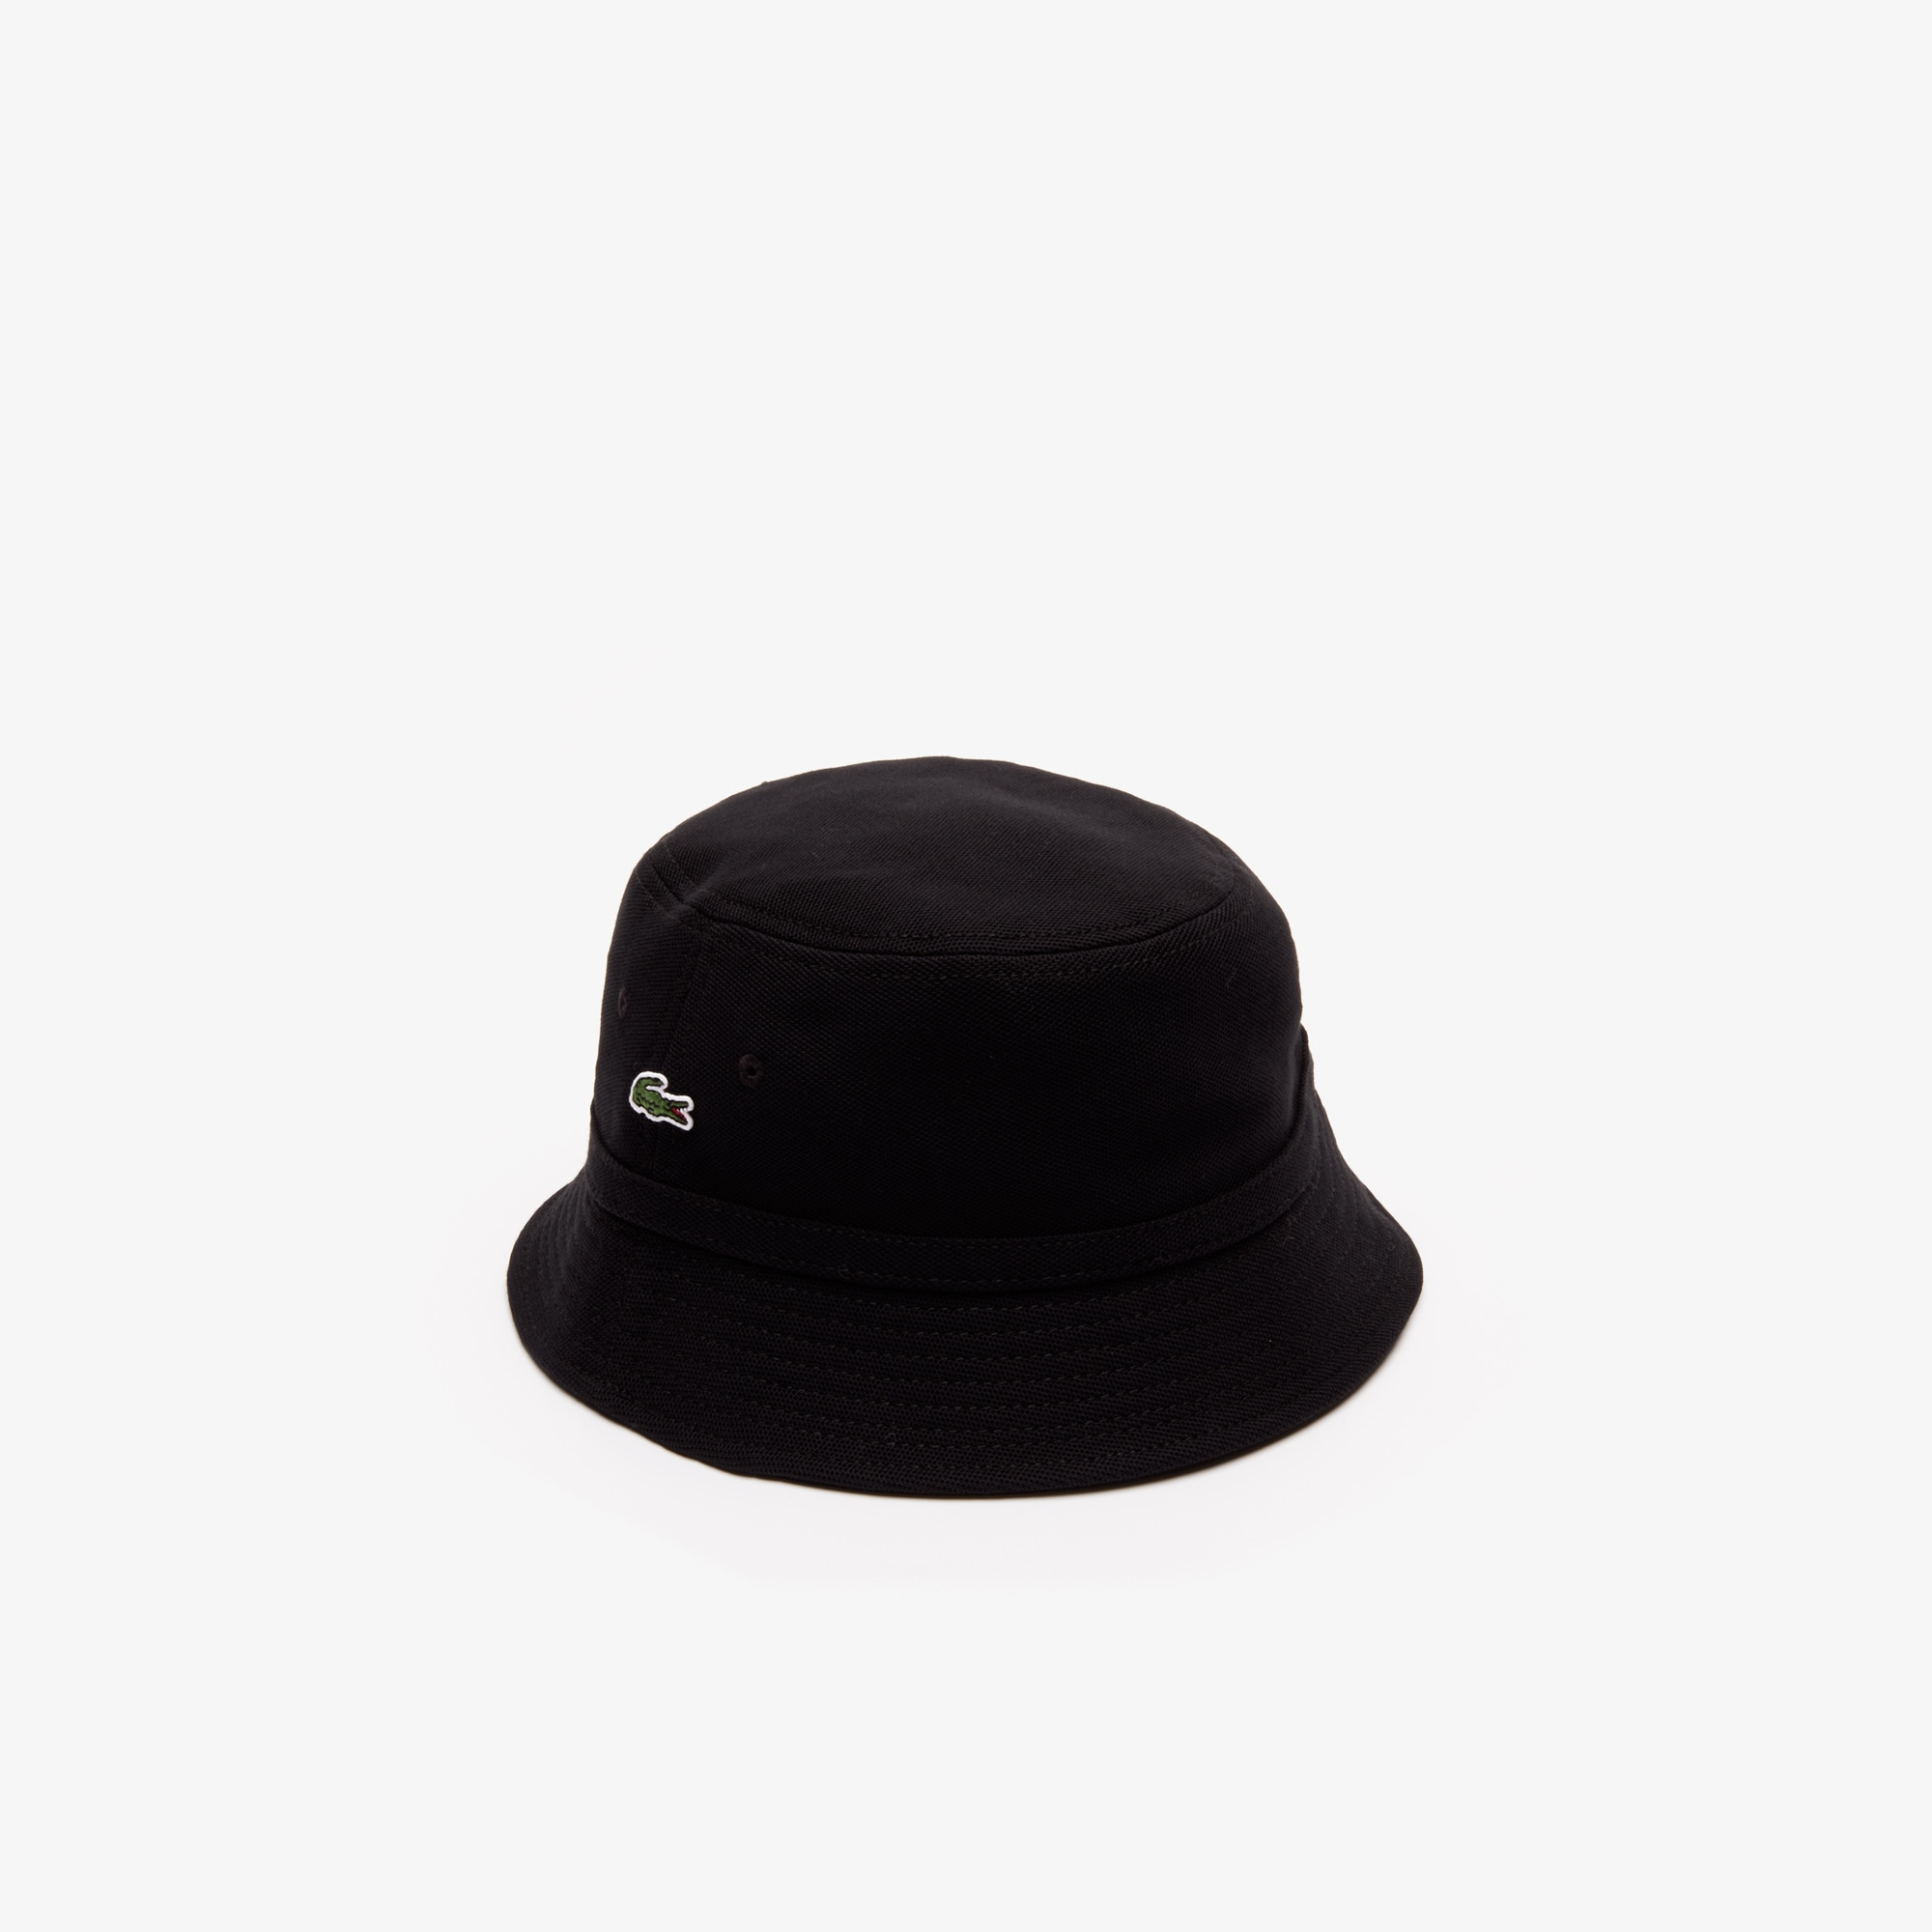 616c8f1172 Men s Cotton piqué bucket hat